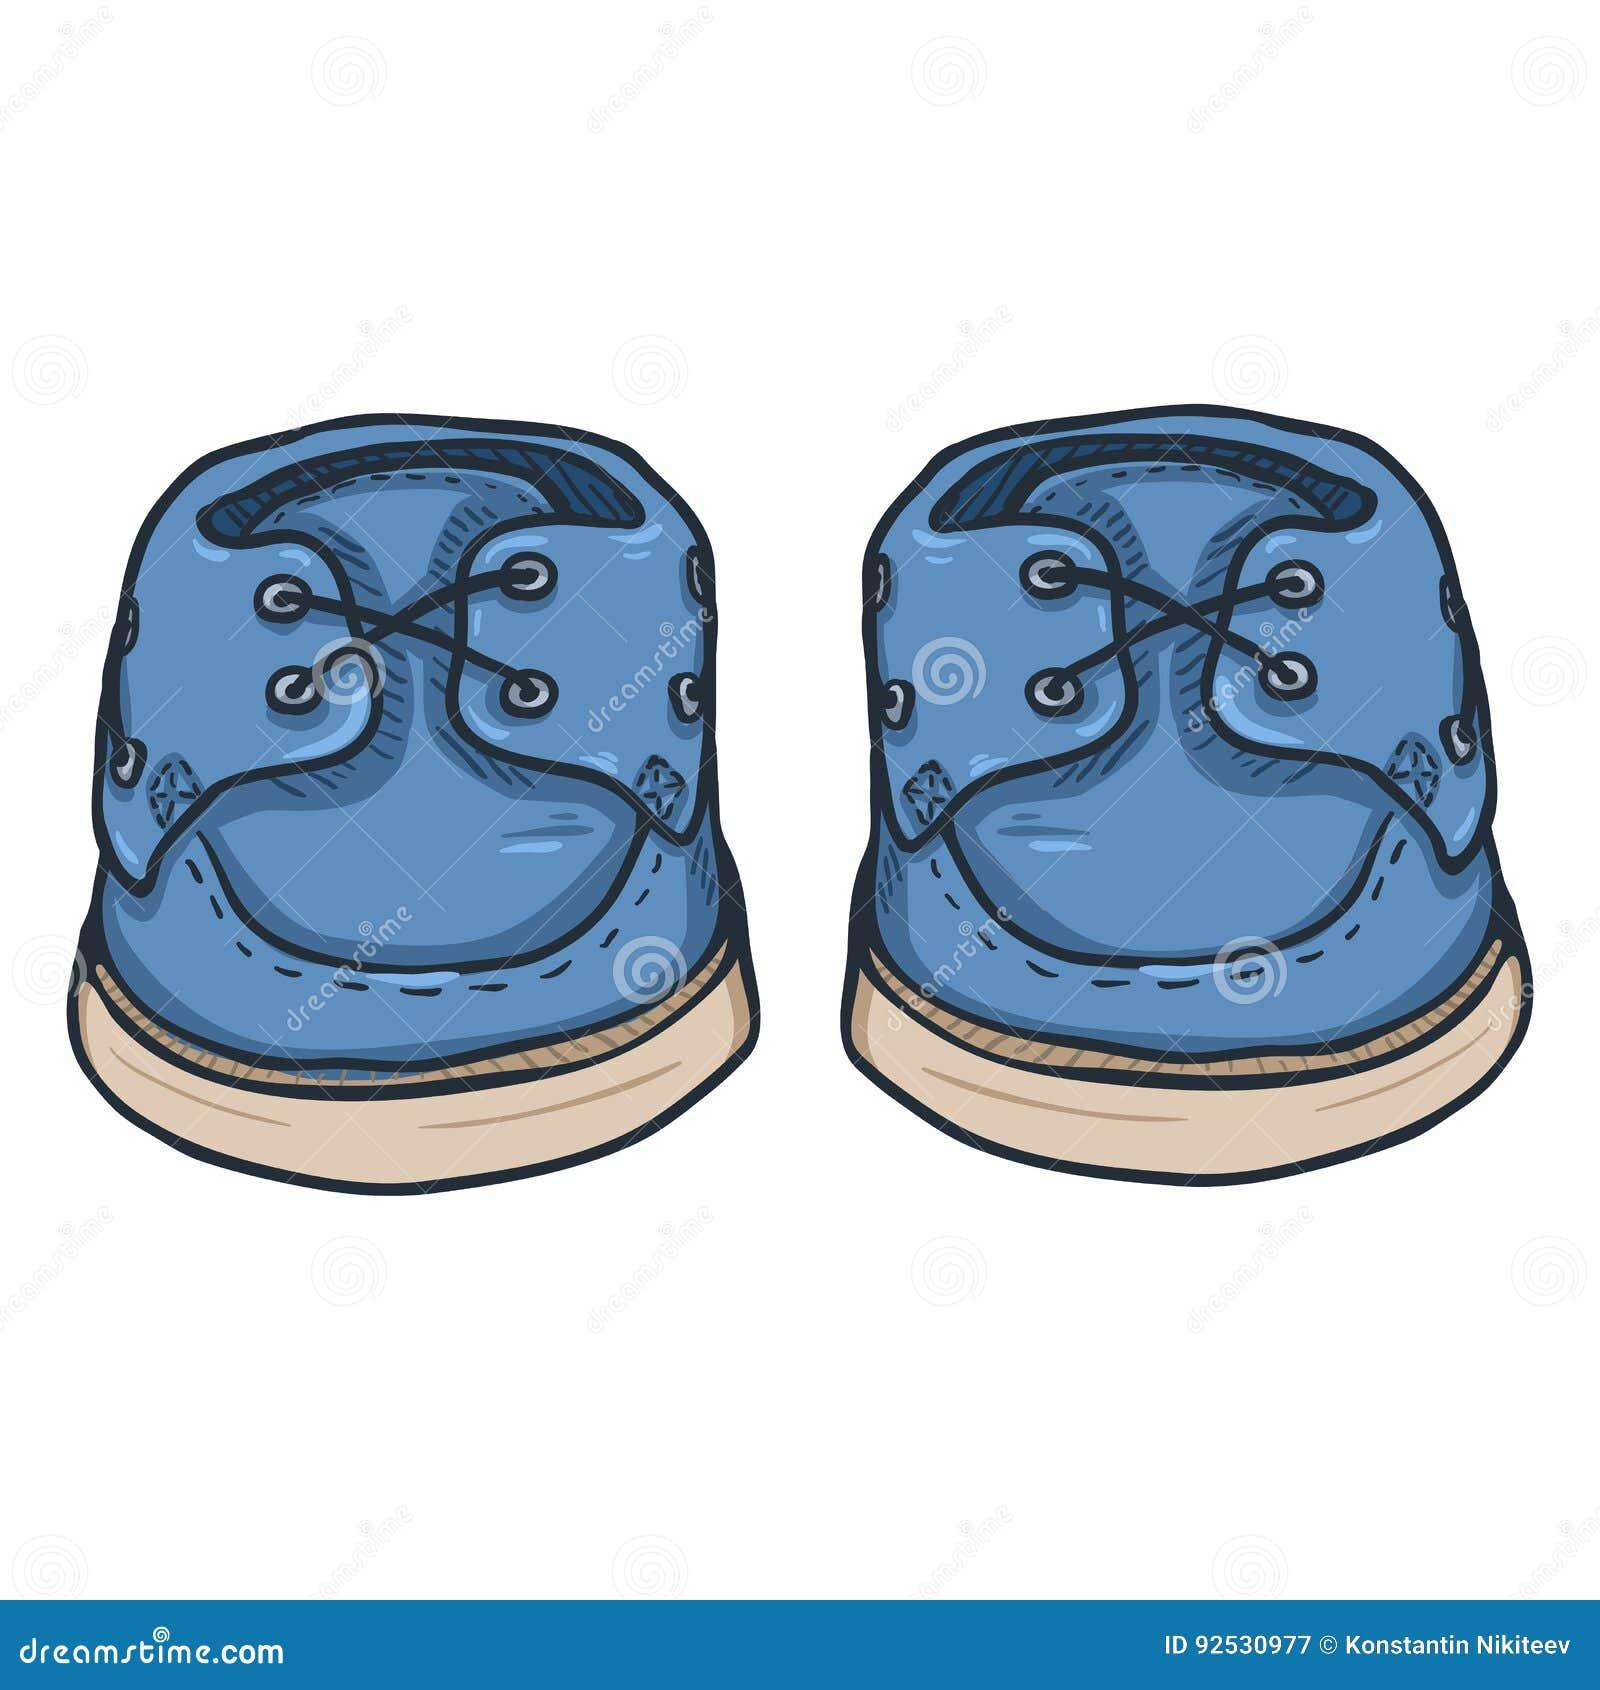 Cartoon Blue Shoes Stock Illustrations 4 612 Cartoon Blue Shoes Stock Illustrations Vectors Clipart Dreamstime